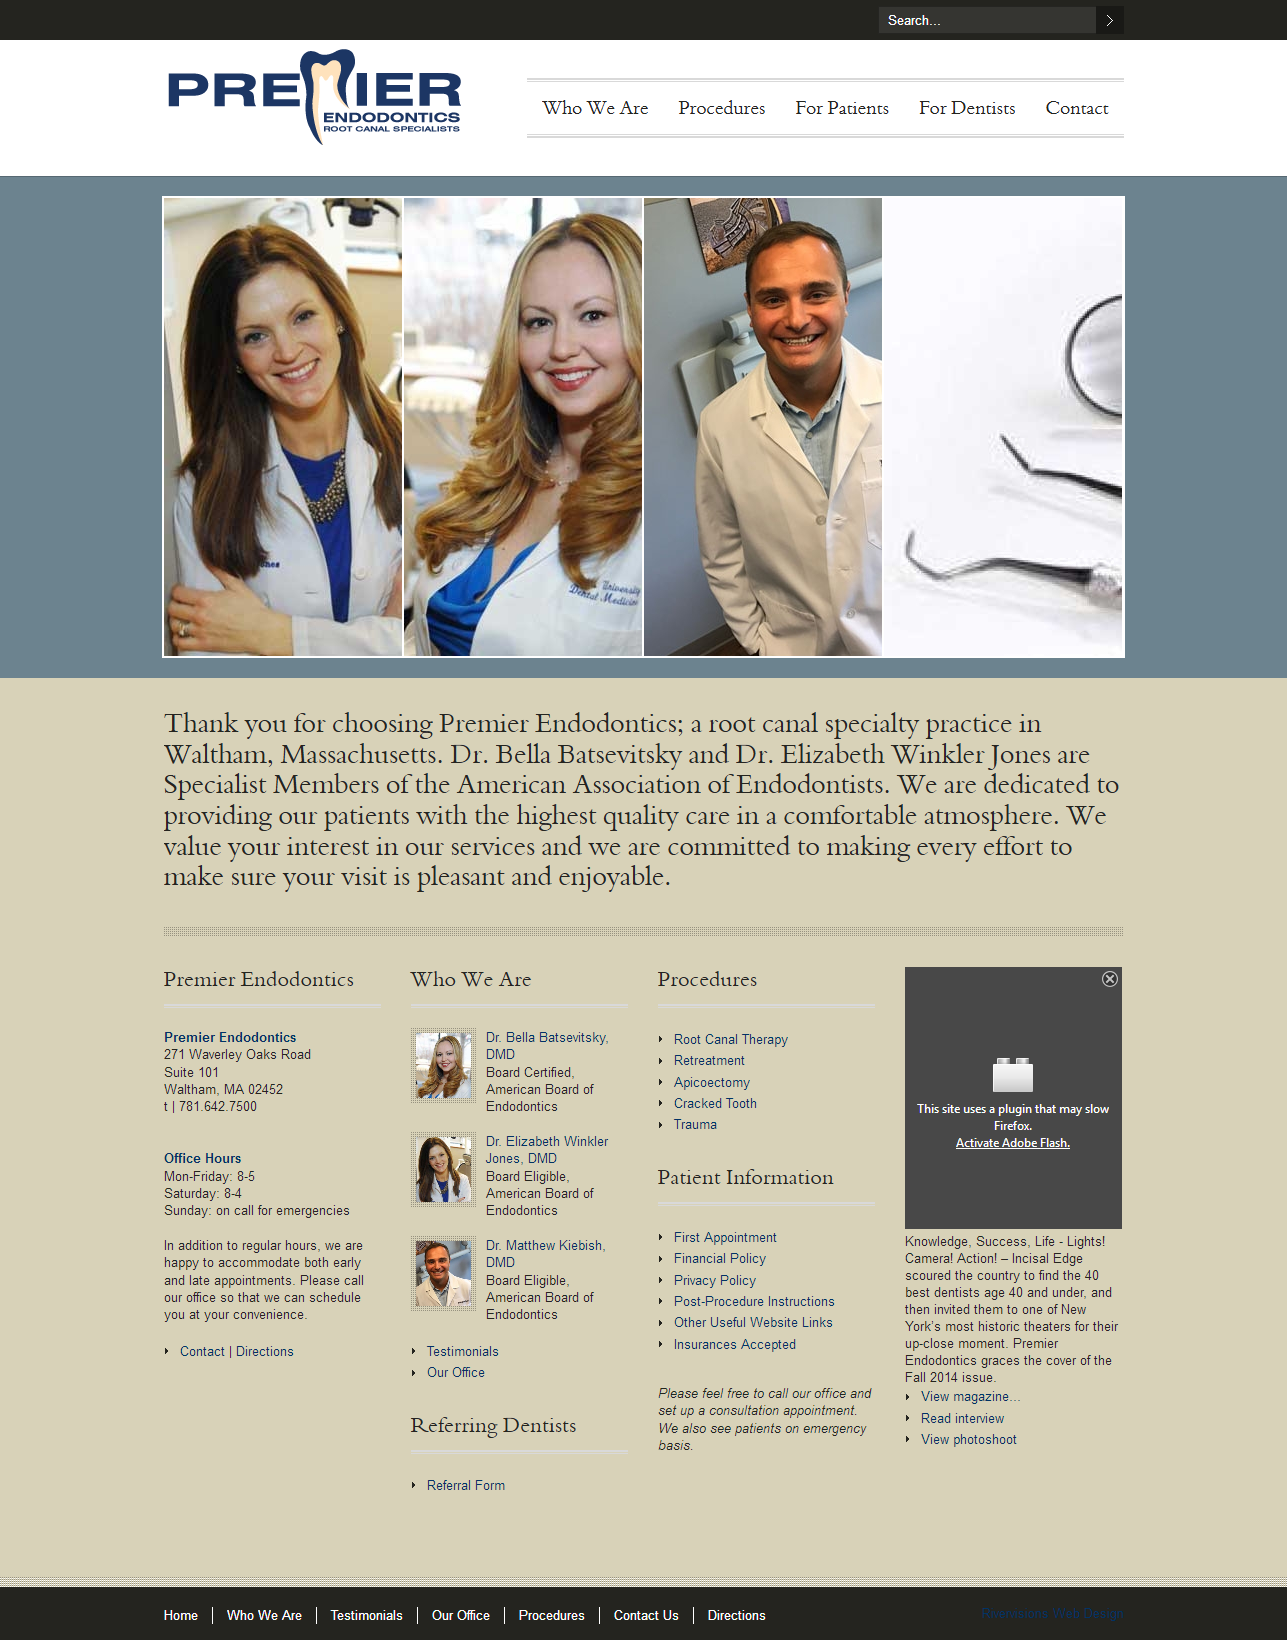 Premier_Endodontics_of_Waltham,_MA